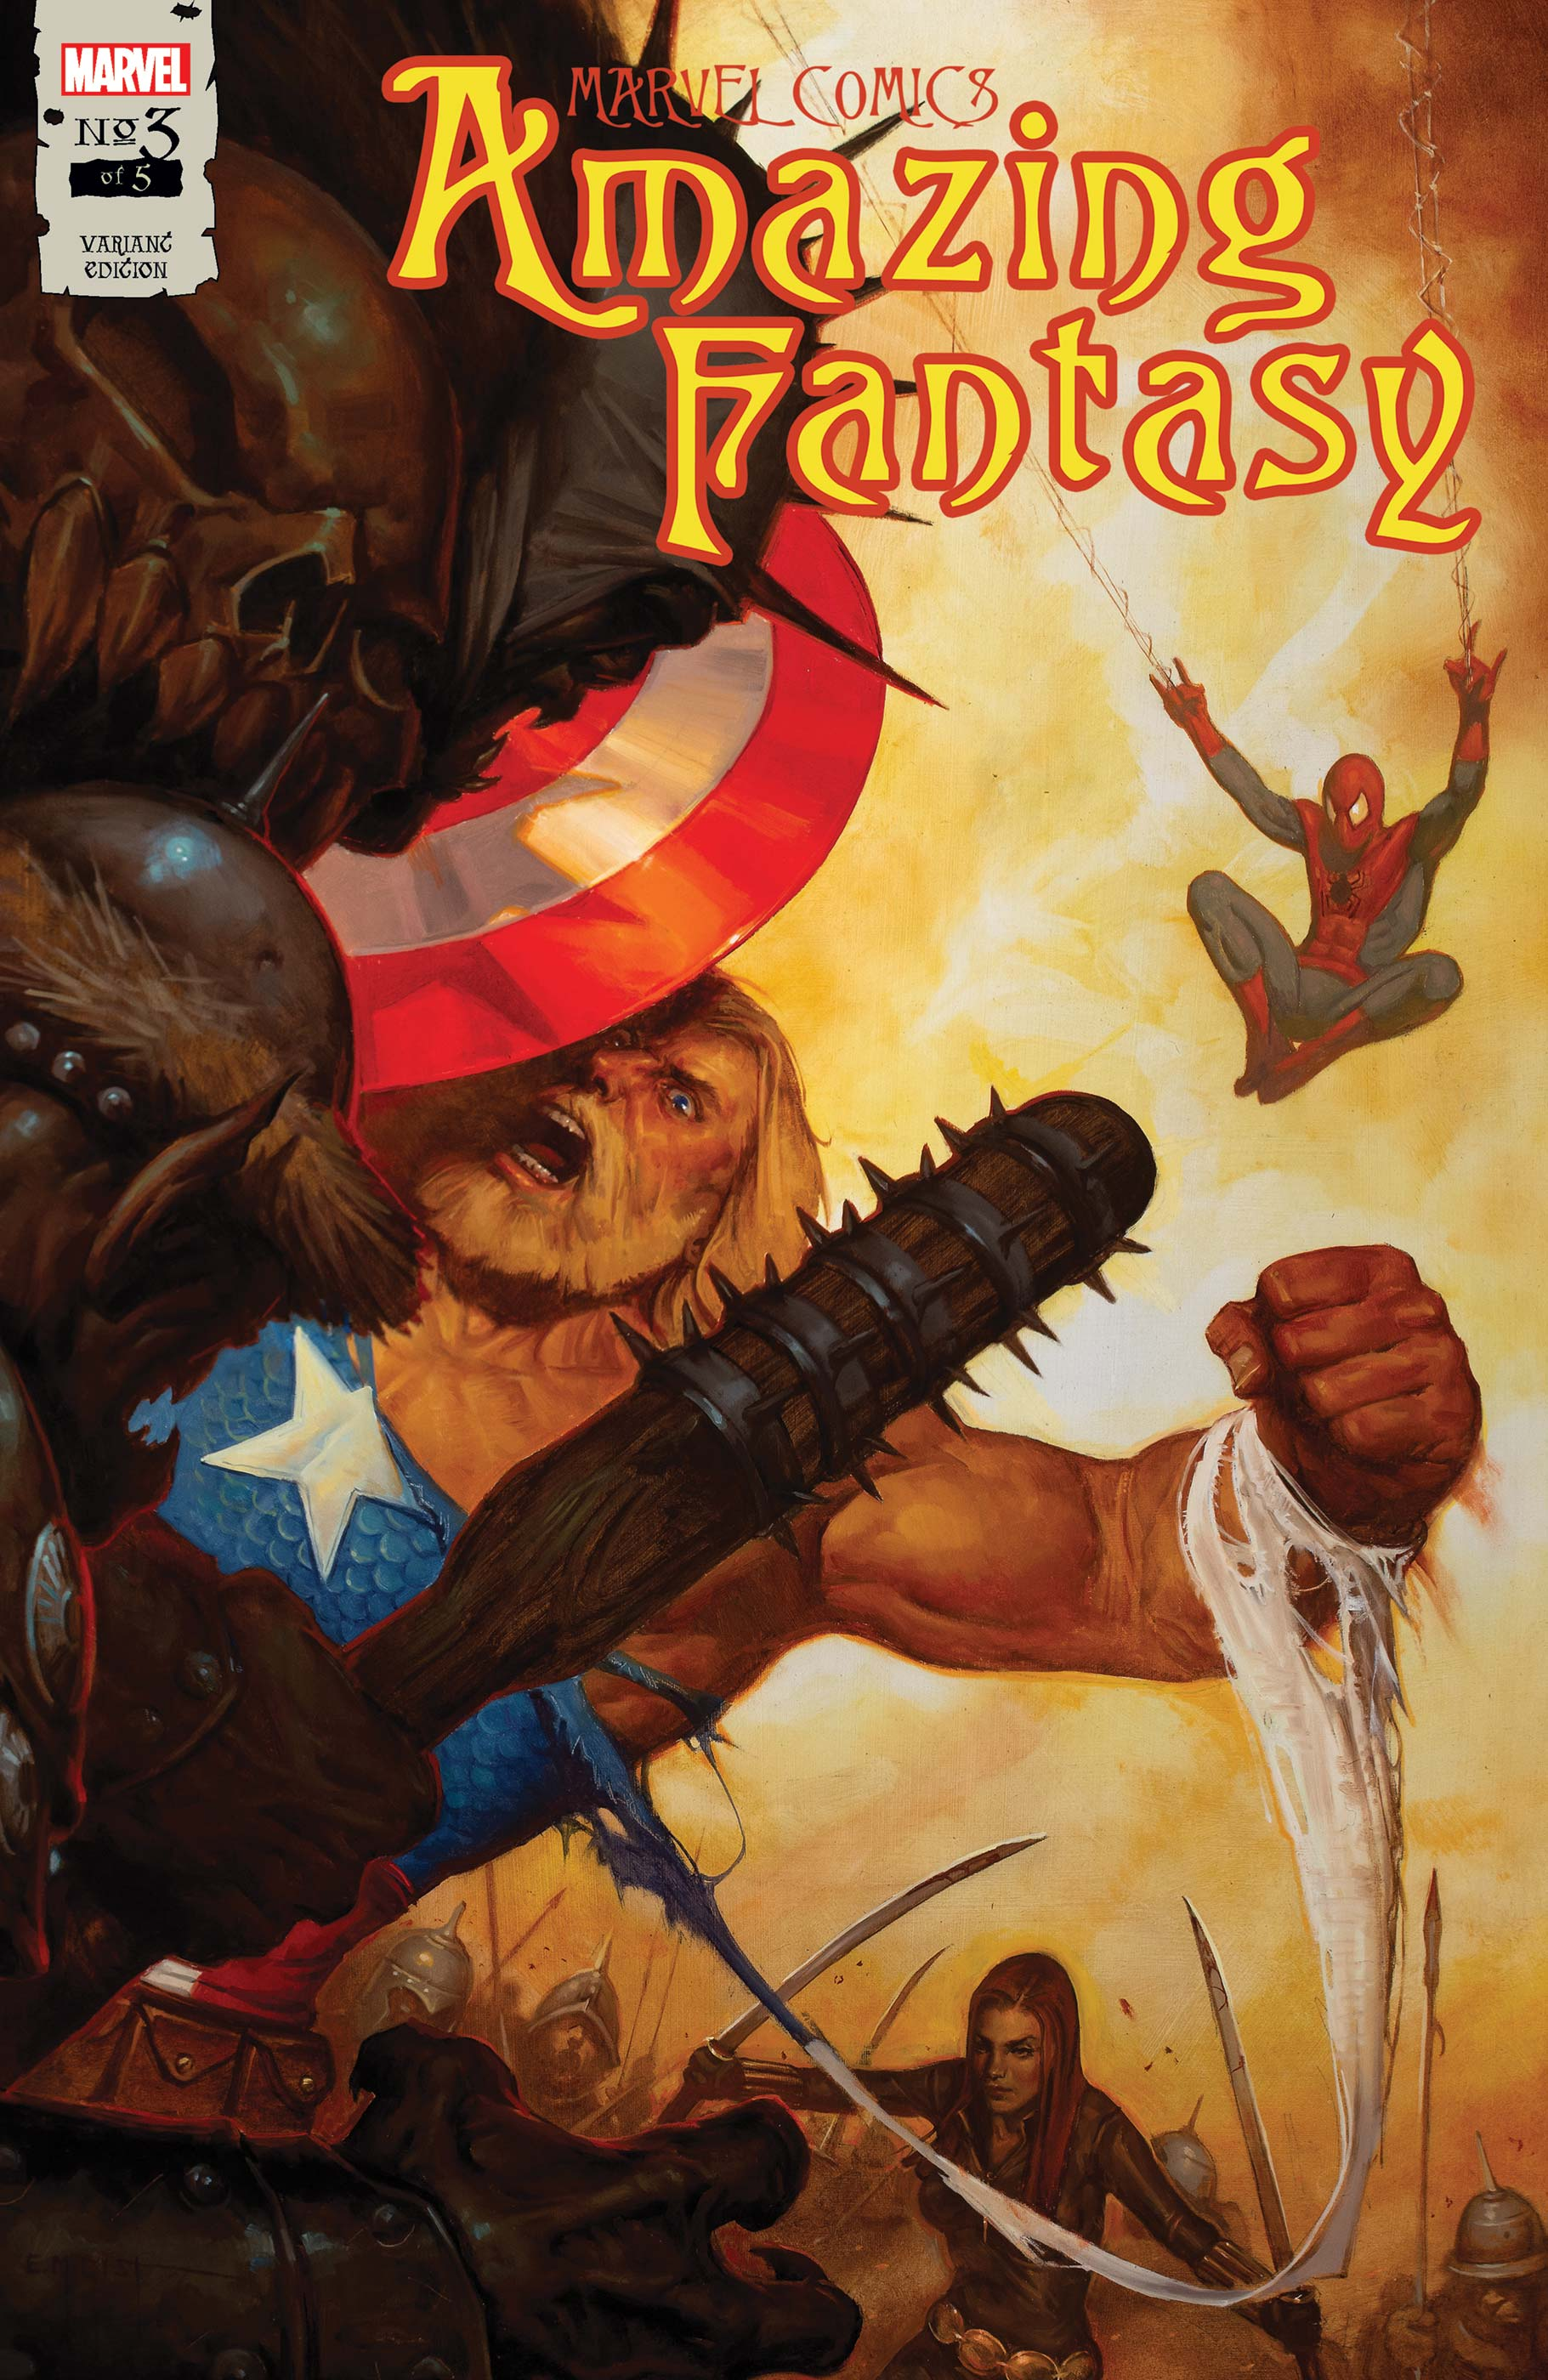 Amazing Fantasy (2021) #3 (Variant)